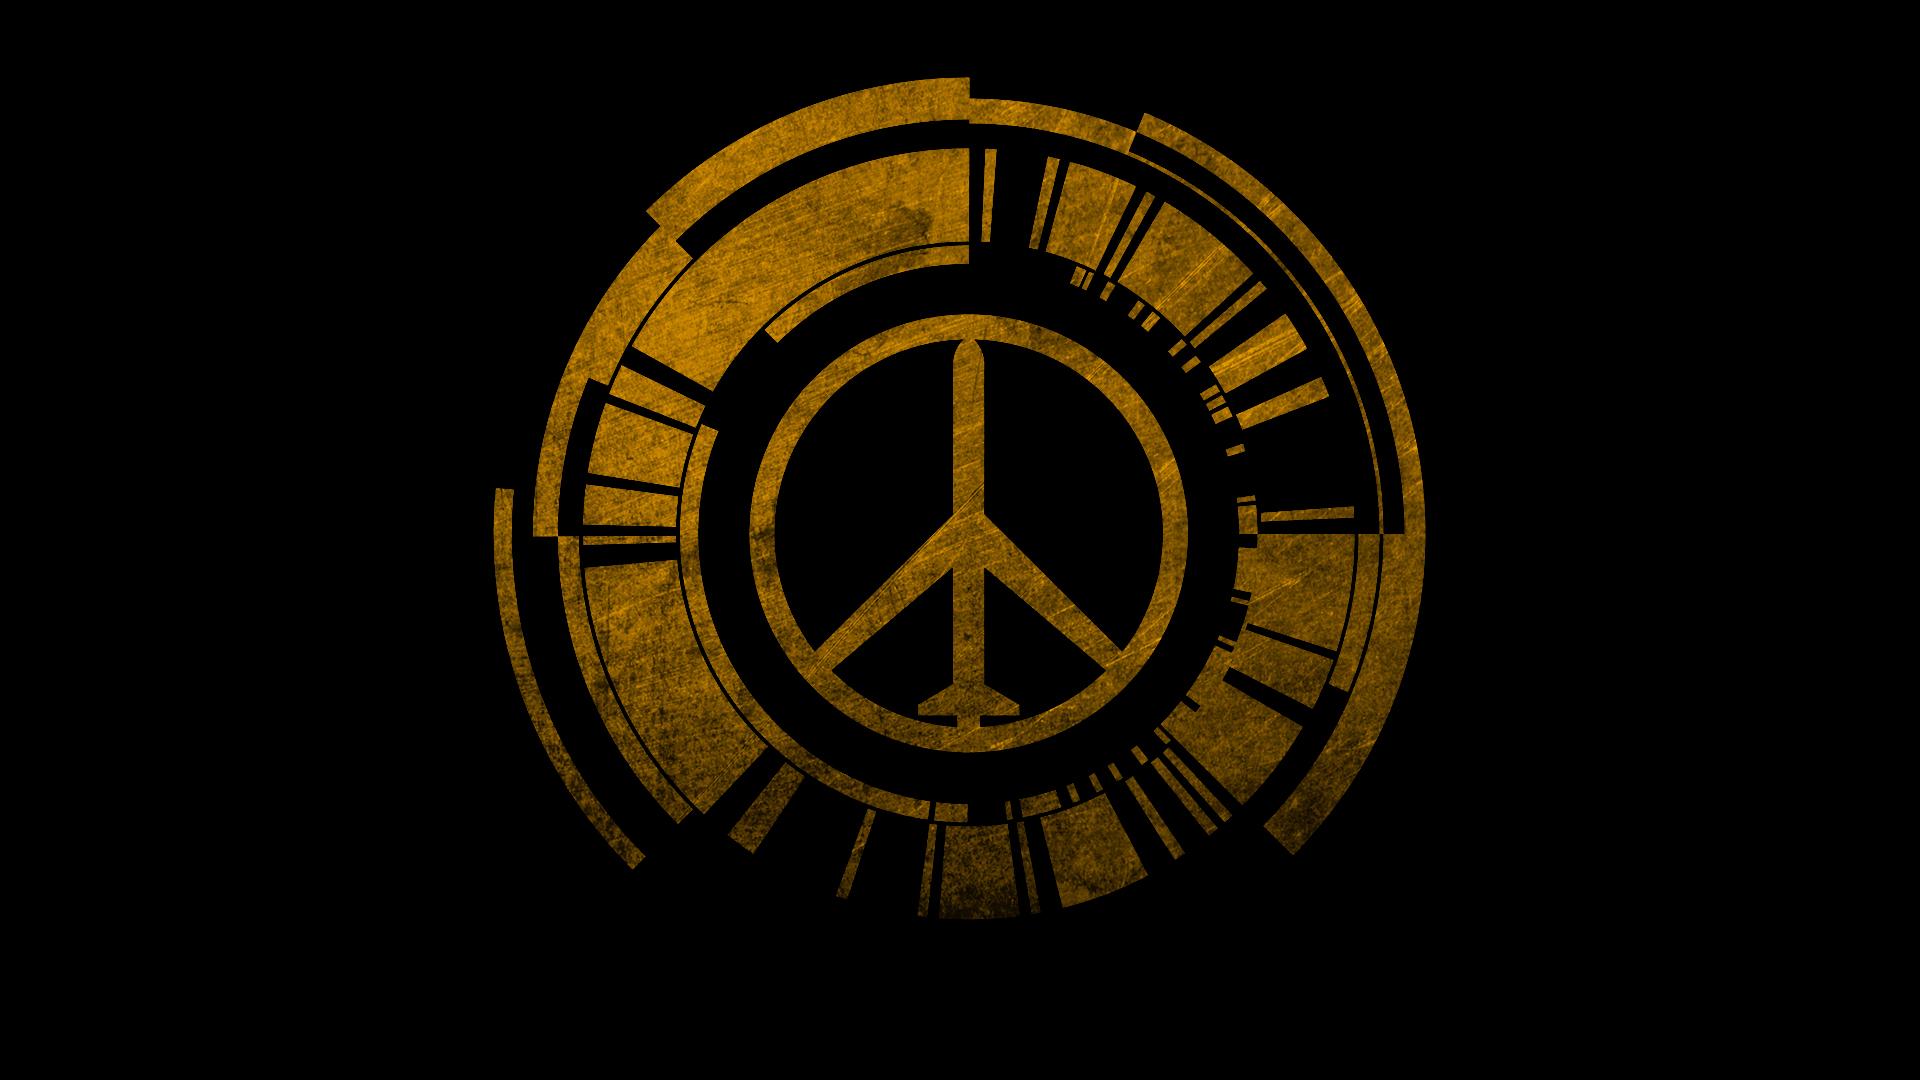 Metal Gear Solid: Peace Walker Details LaunchBox Games